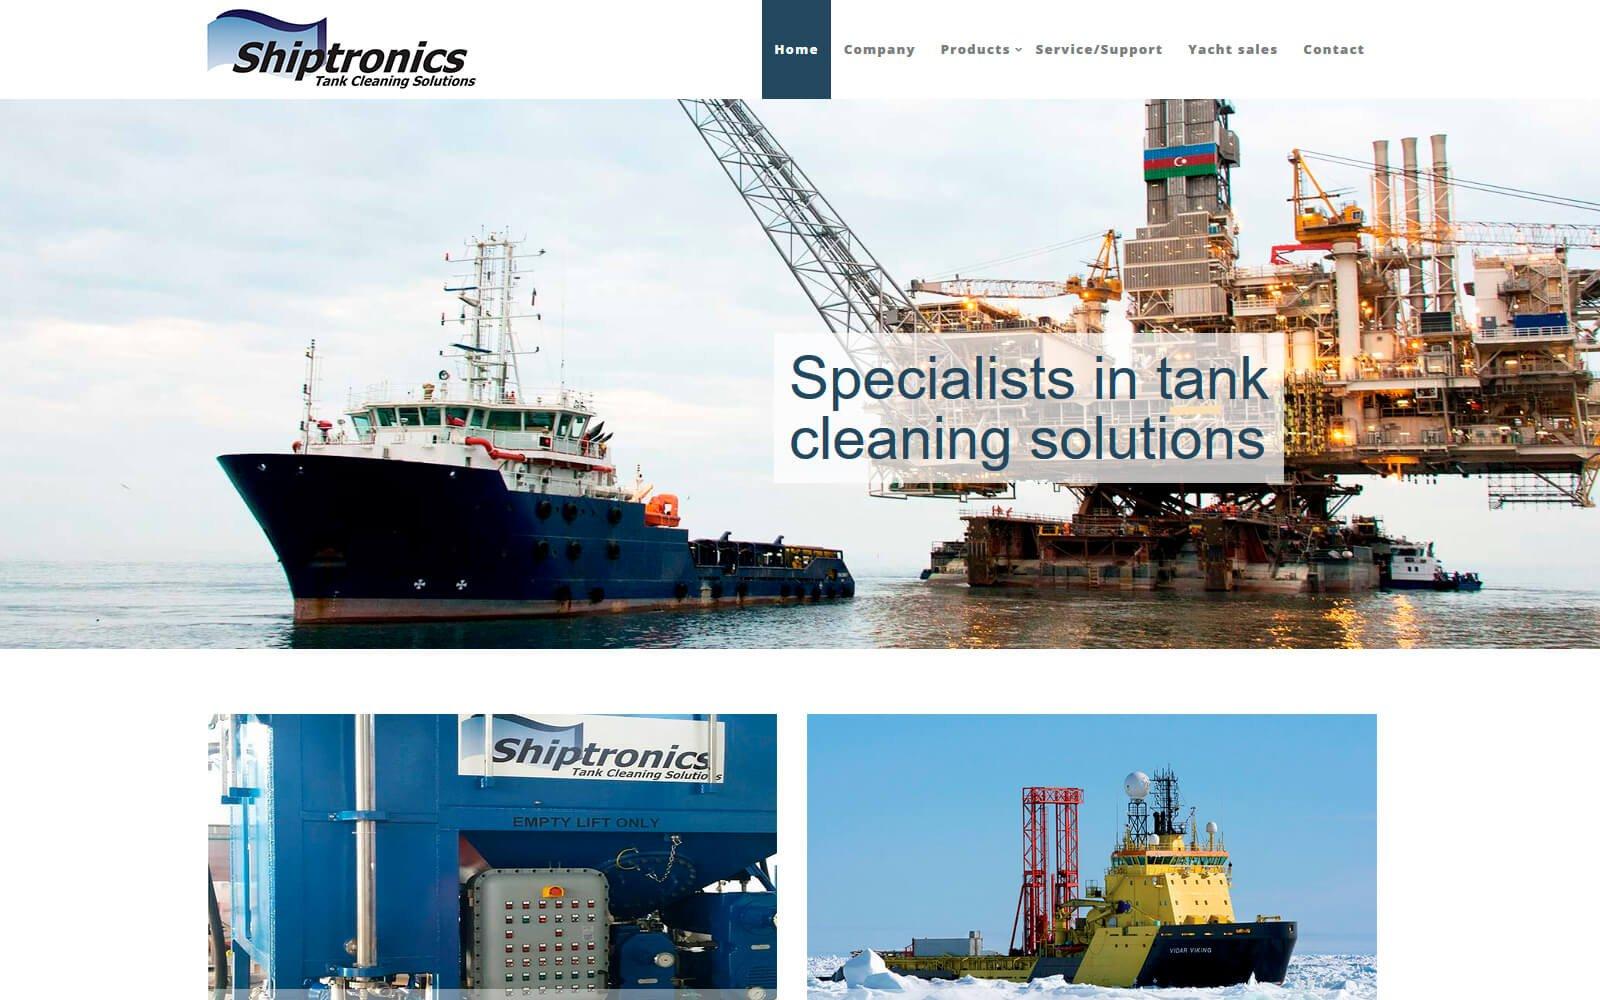 Shiptronics webside